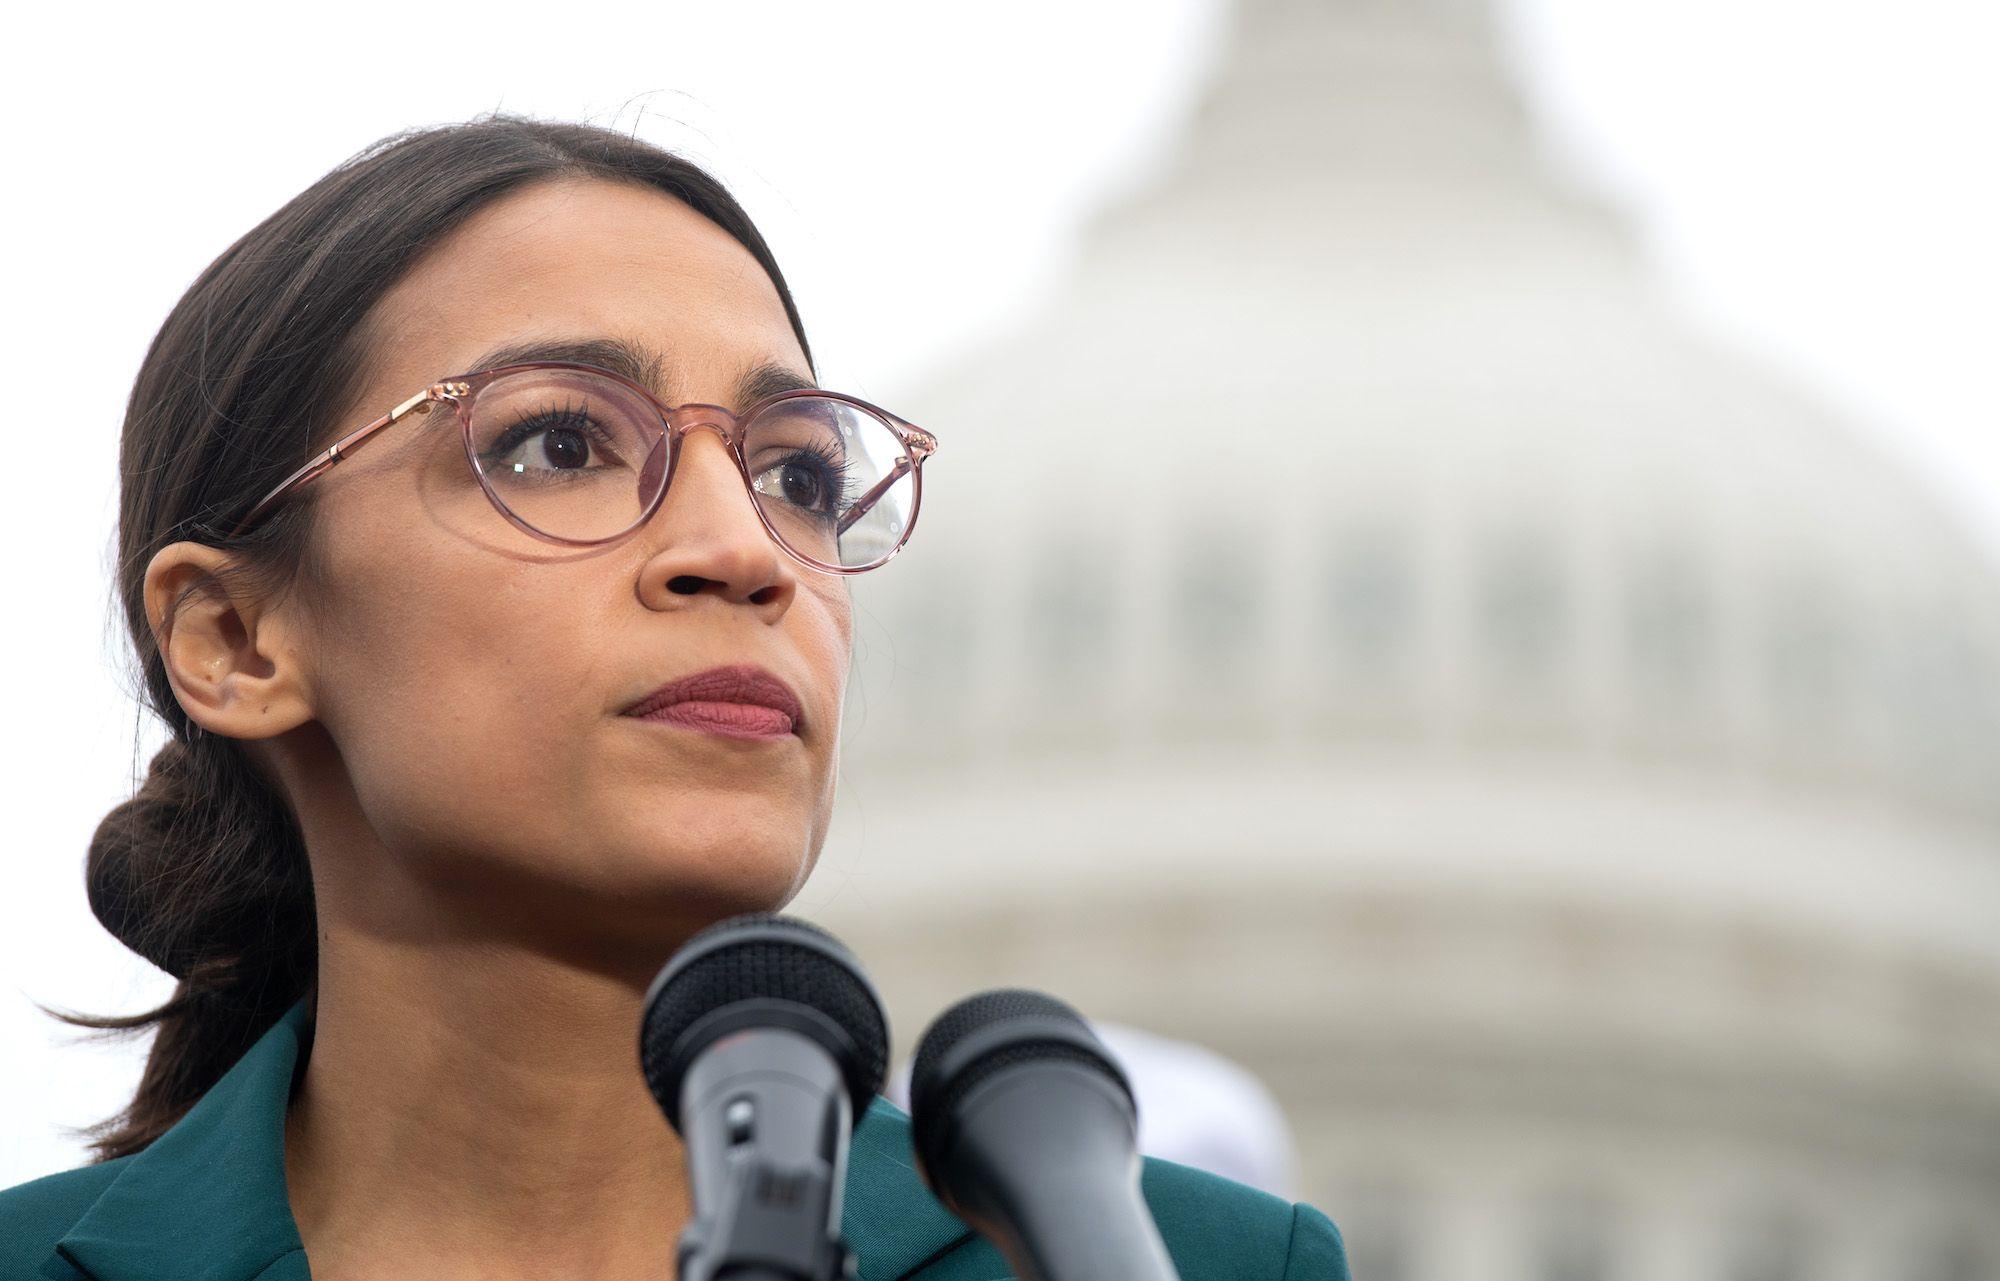 Alexandria Ocasio-Cortez Plays the 'Bad Guy' to Illuminate the Relentless Corruption in American Politics